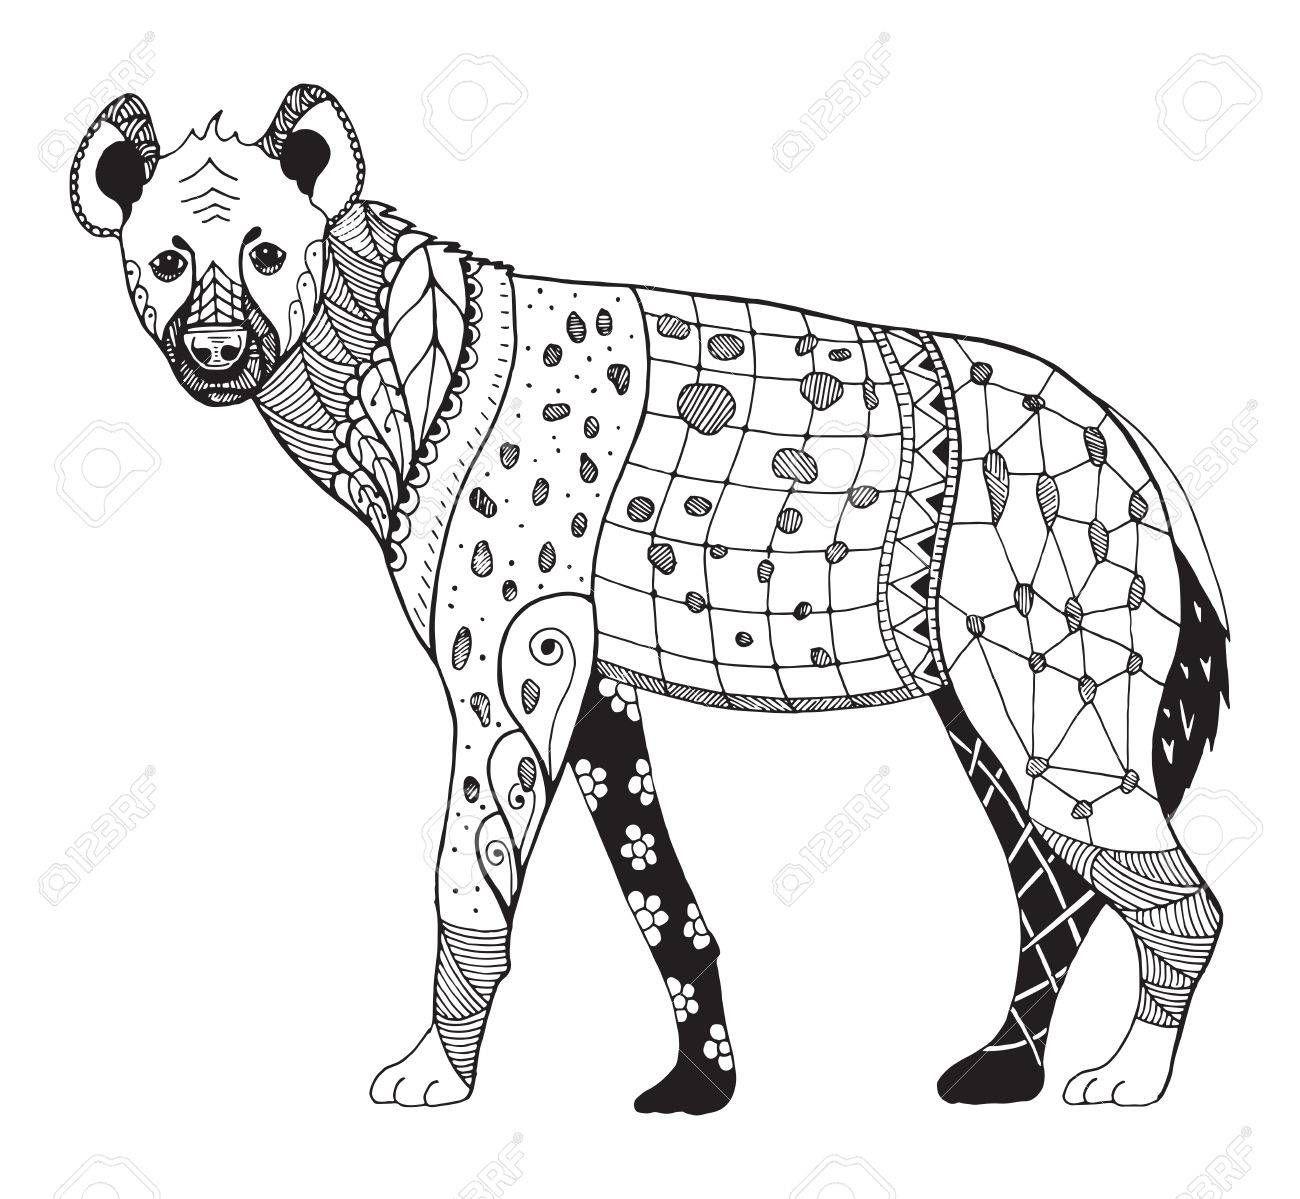 Hyena Zentangle Stylized Vector Illustration Freehand Pencil Hyena Zen Art Pattern Art